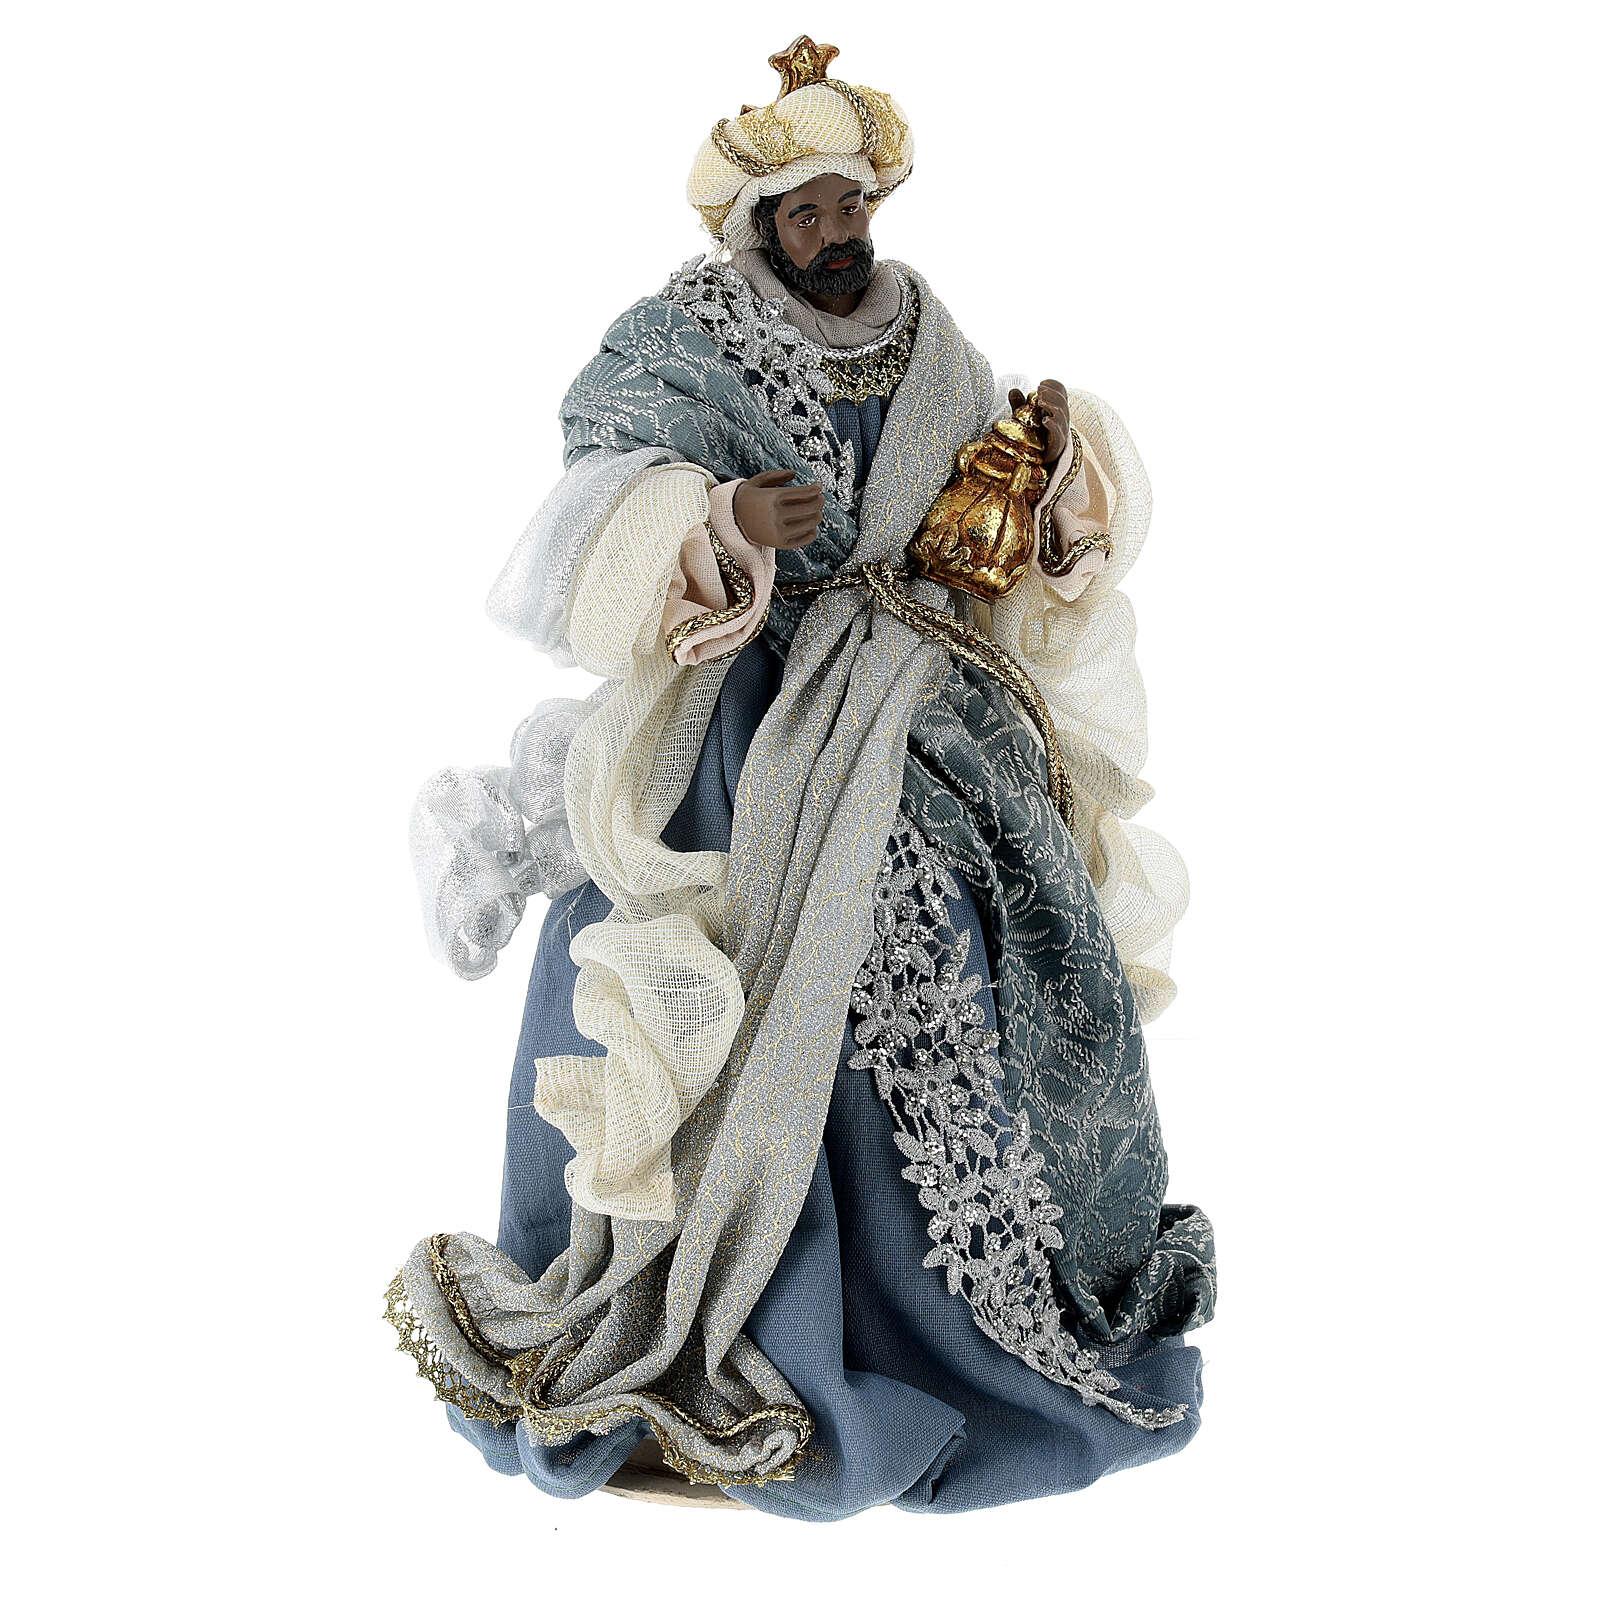 Natività 6 pezzi blu argento resina stoffa 40 cm stile veneziano 4